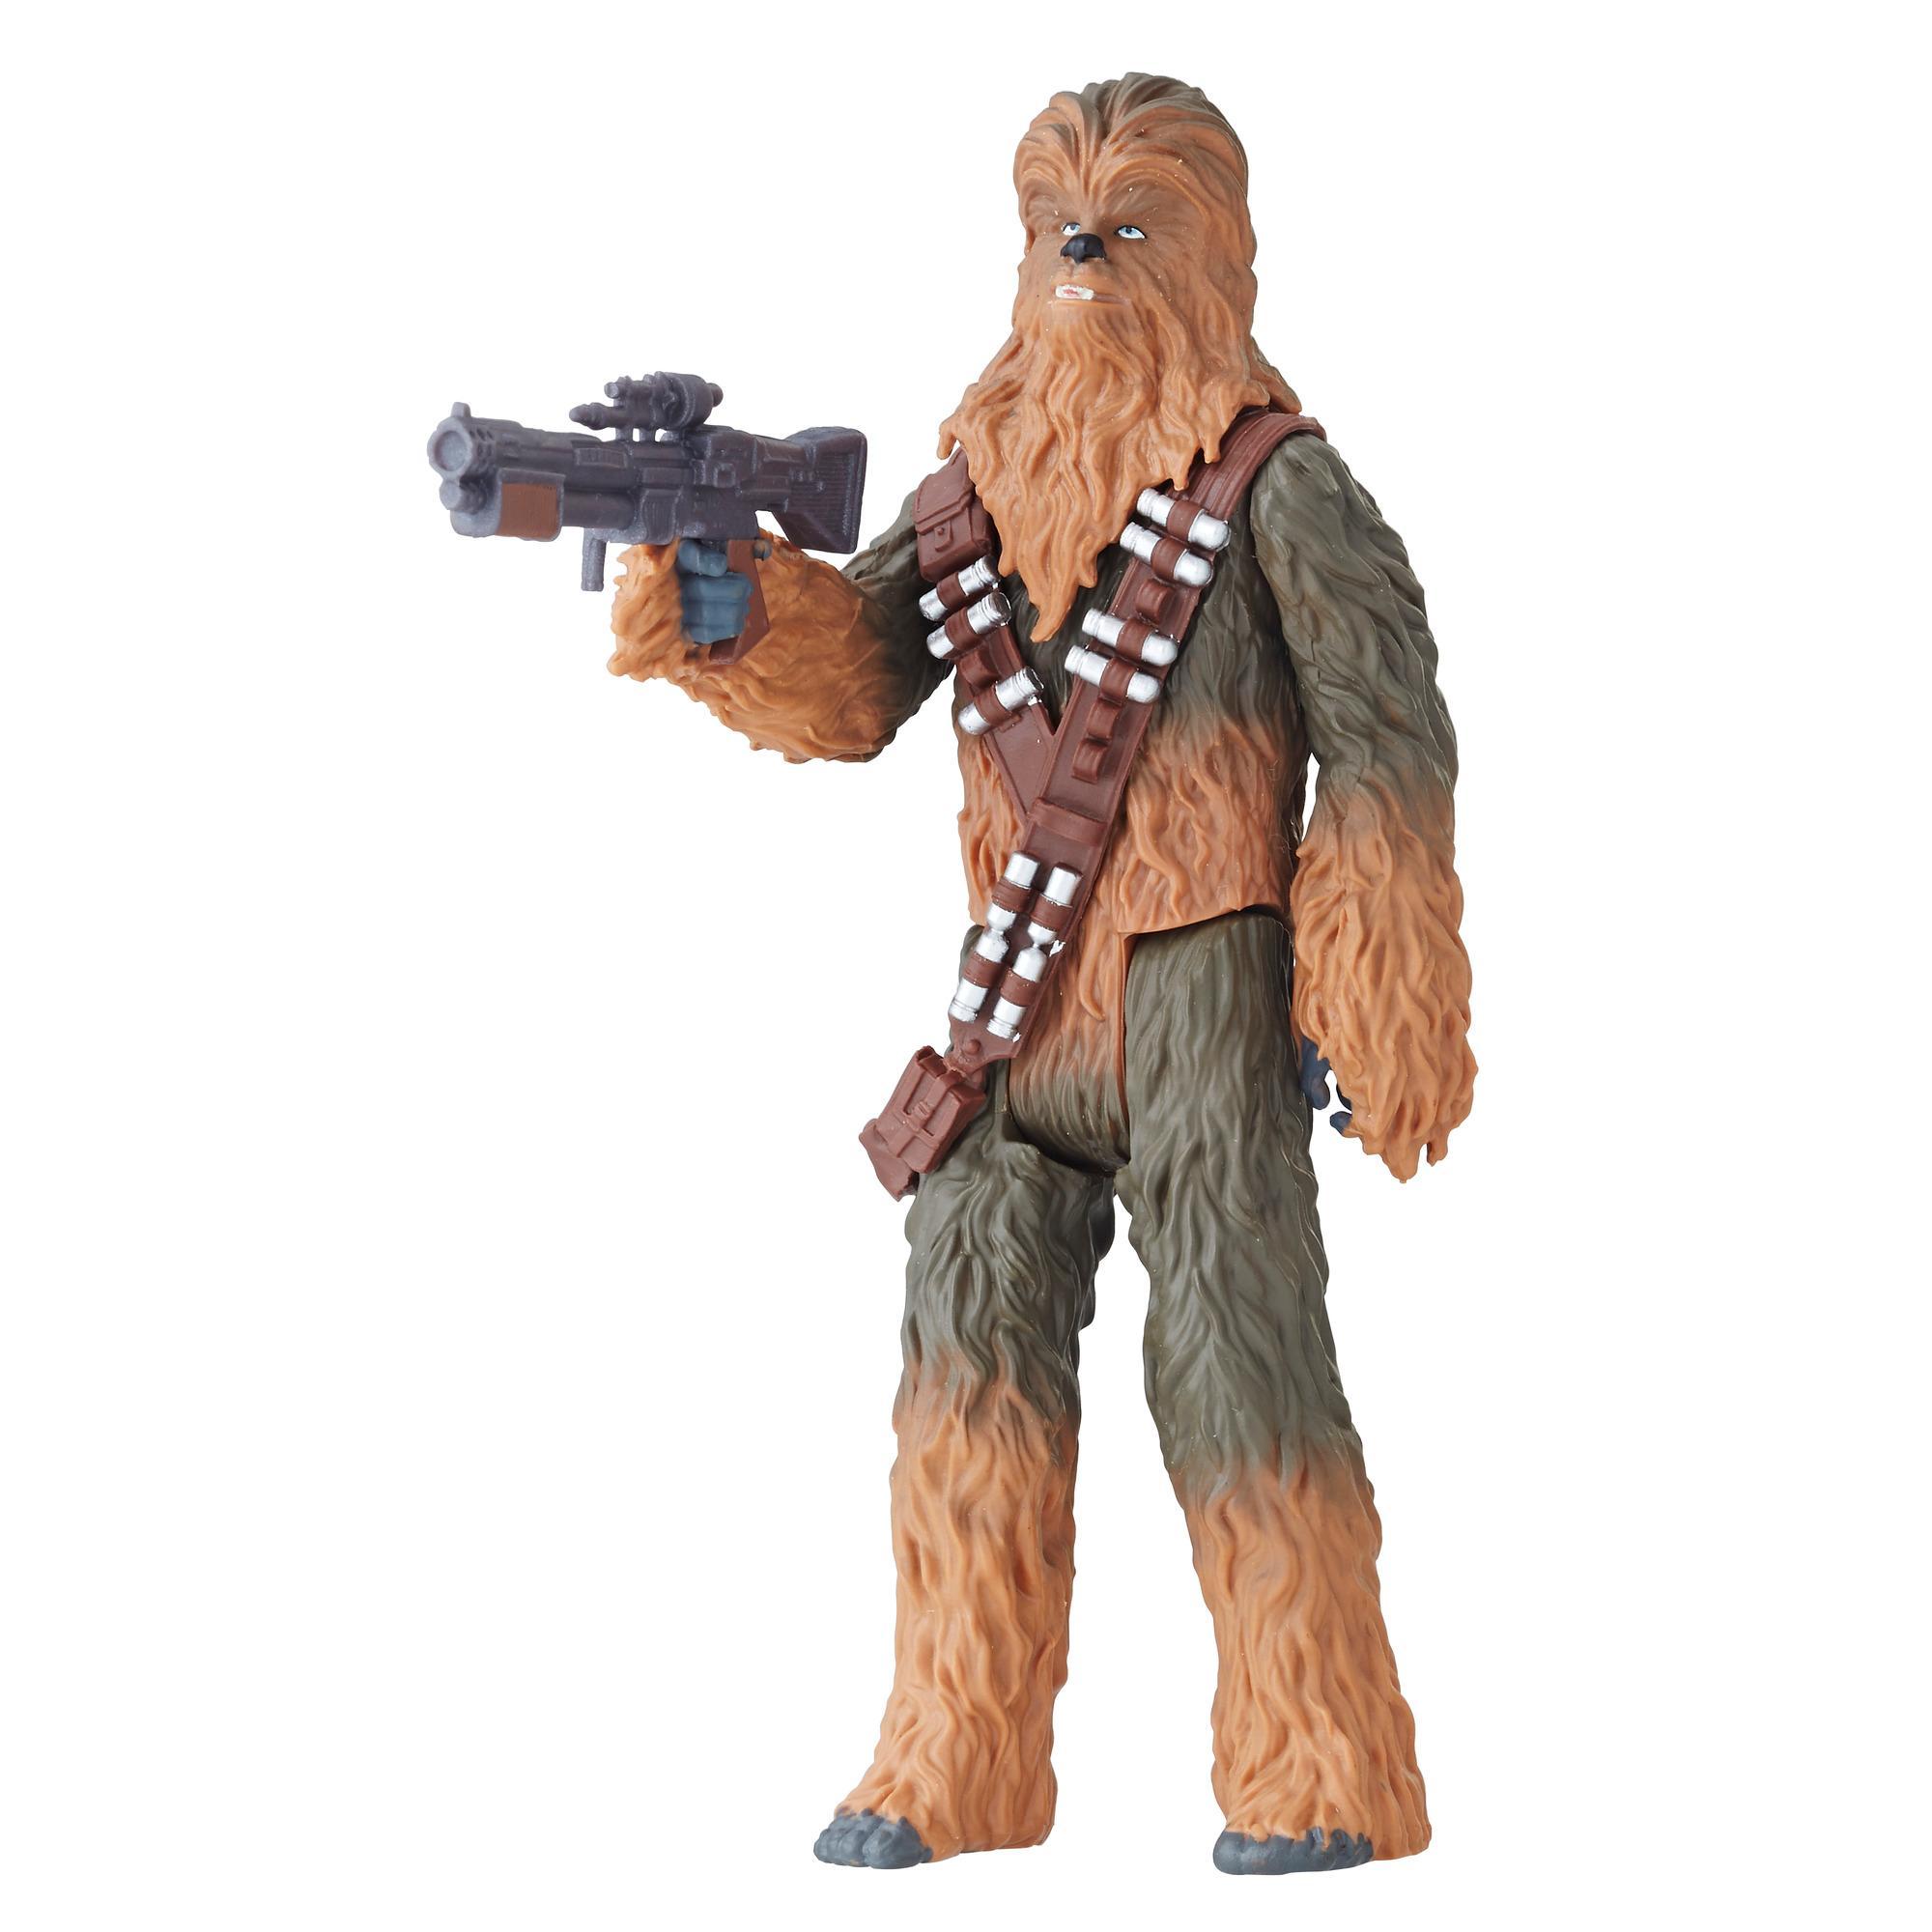 Star Wars Force Link 2.0 - Figurine Chewbacca